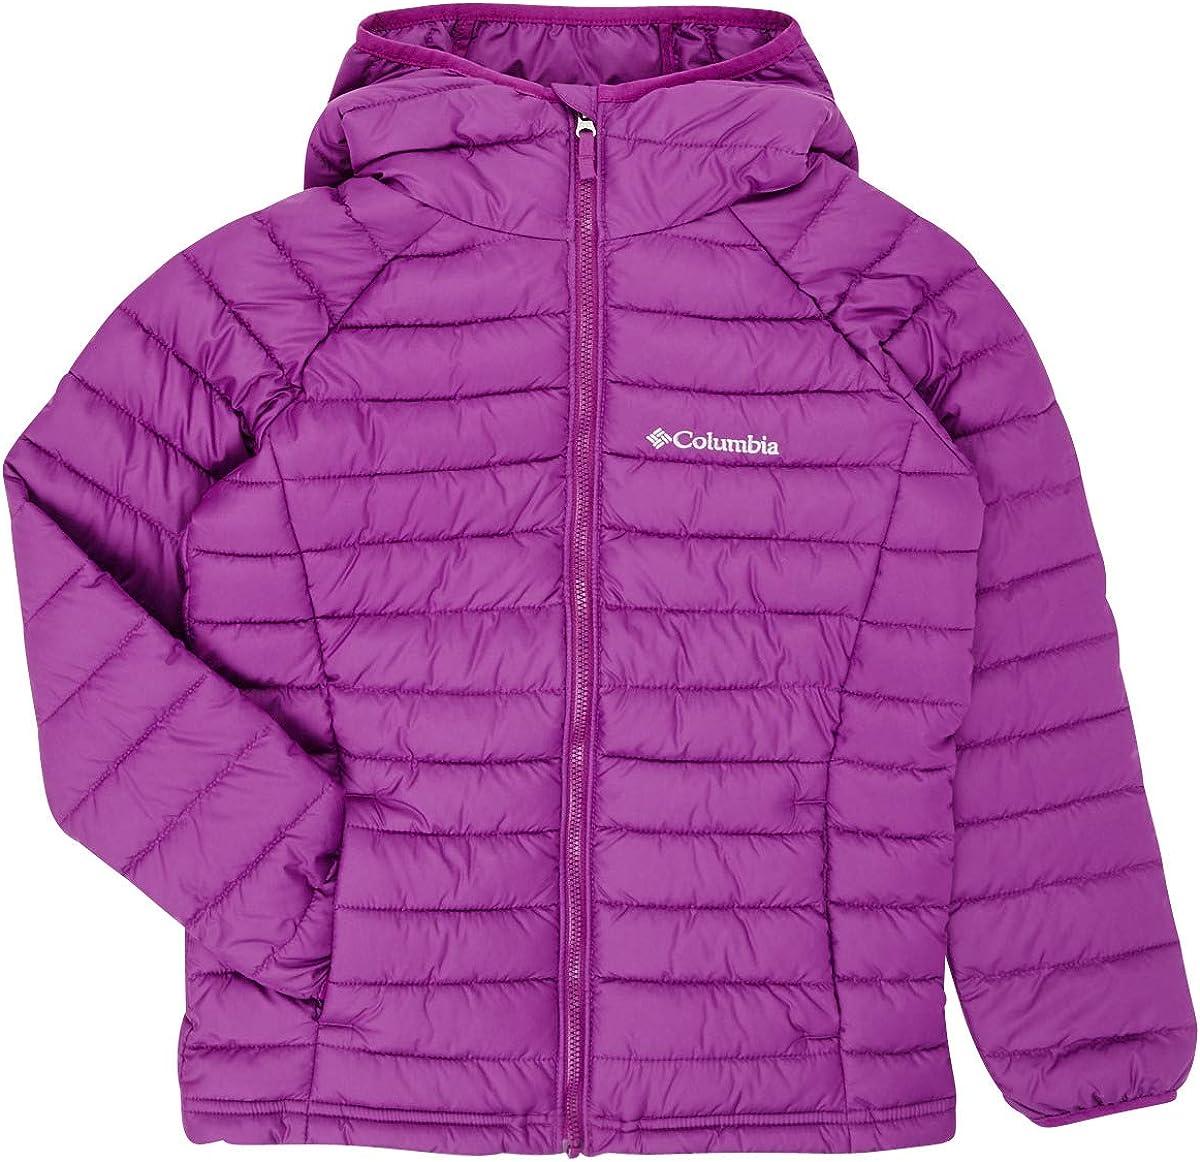 Columbia Youth Powder Lite Chaqueta con capucha para niña